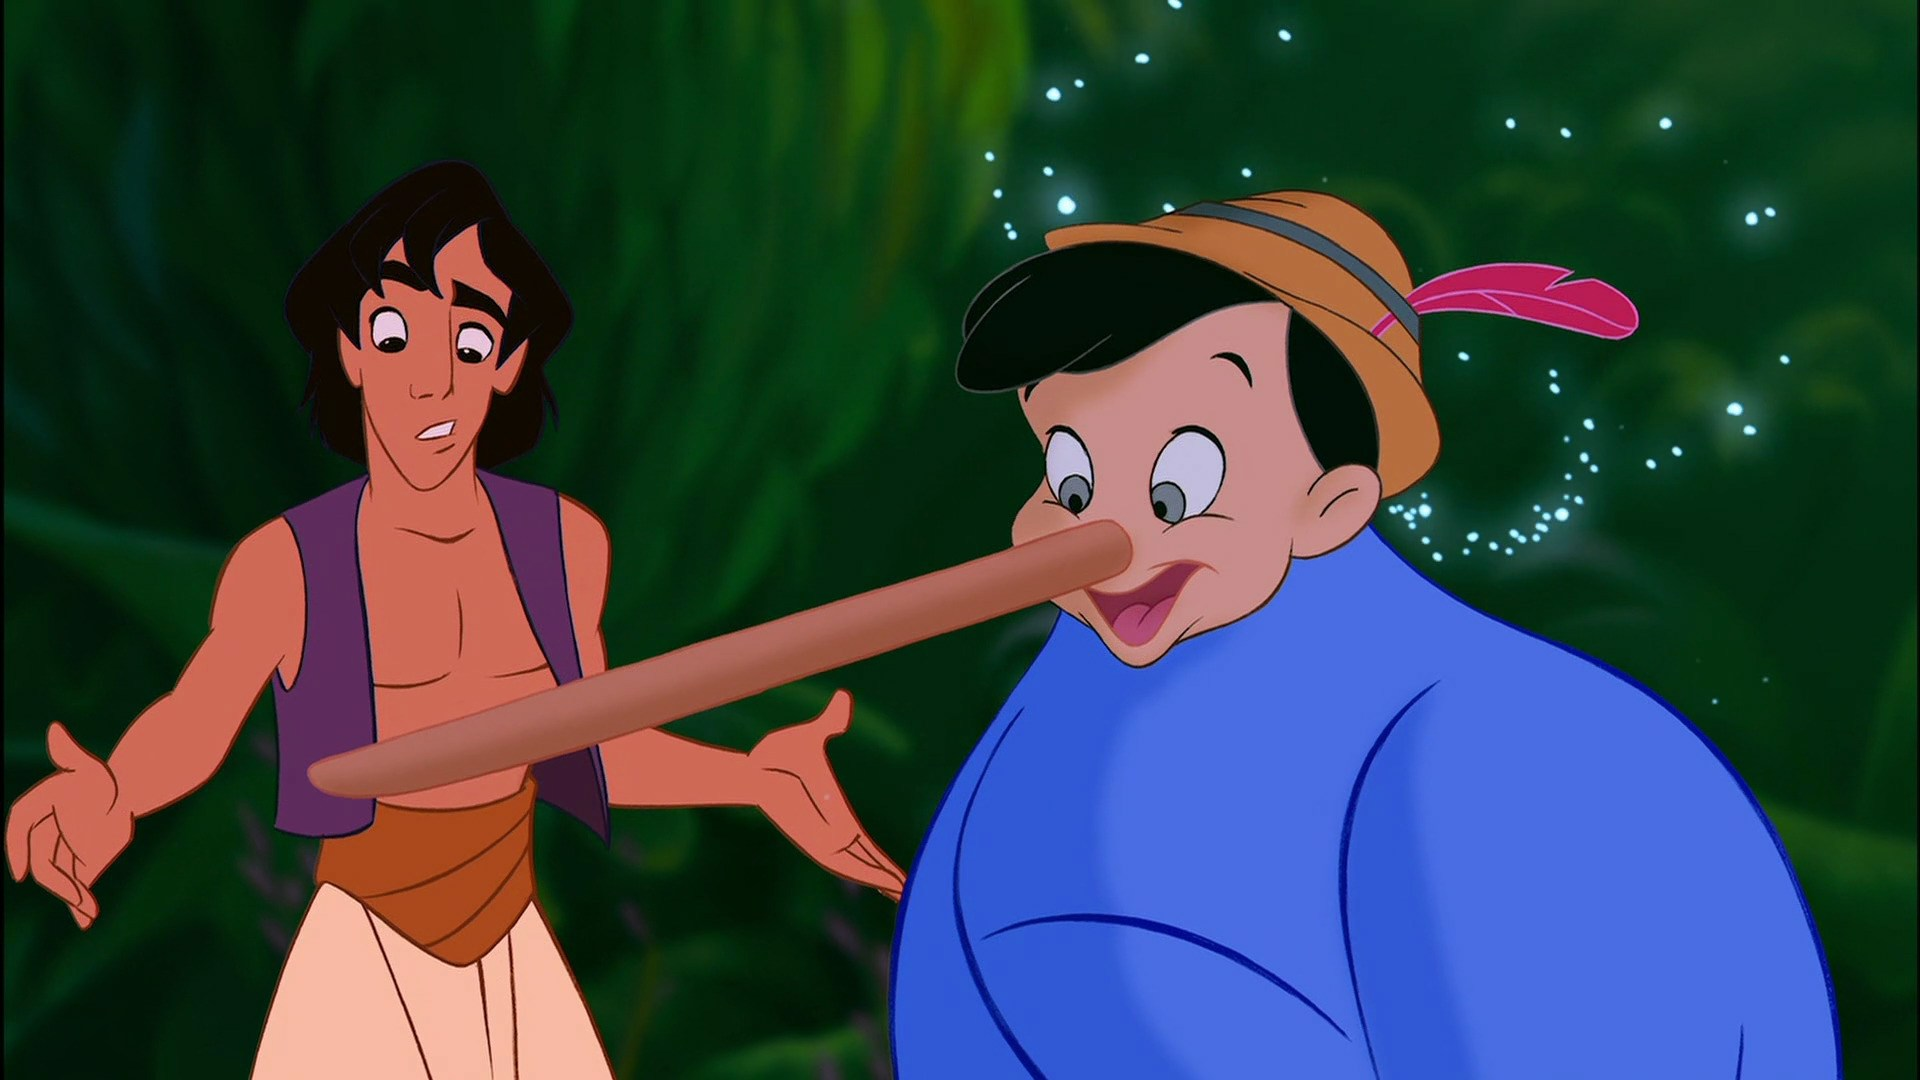 File:Aladdin-pinocchio.jpg